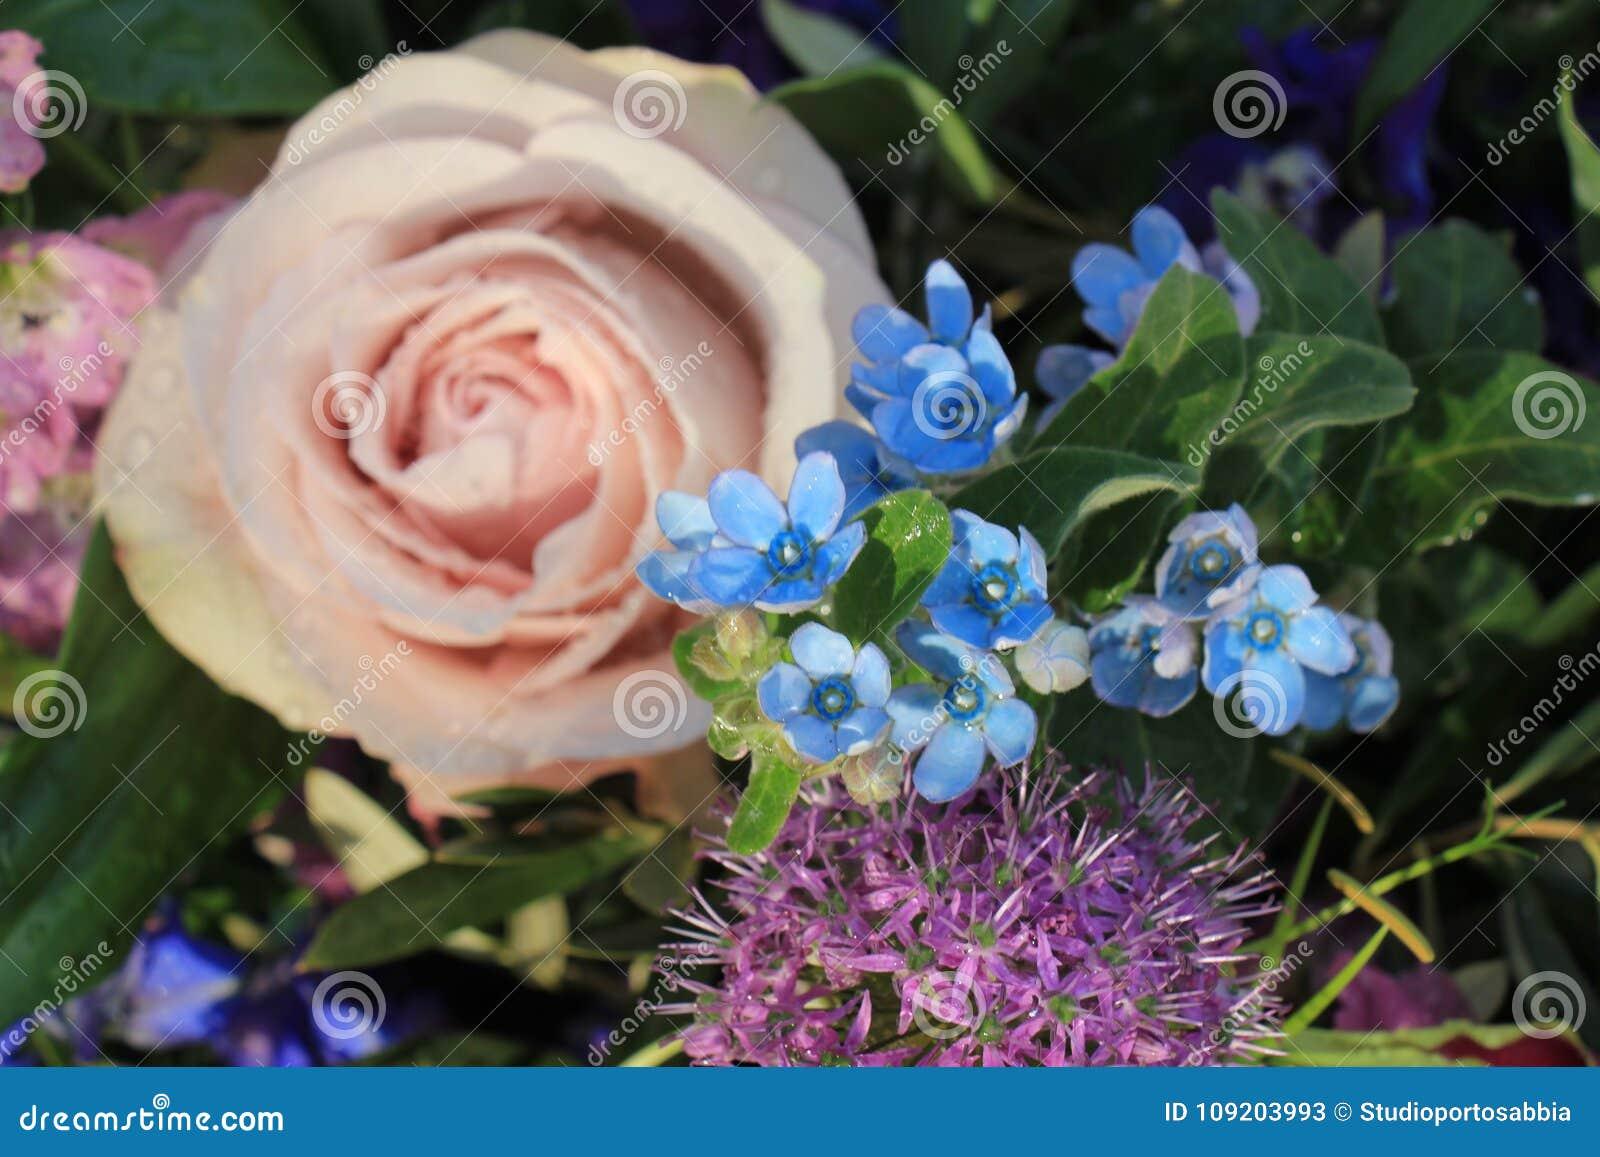 Big Purple Roses Stock Image Image Of Pastel Arrangement 109203993